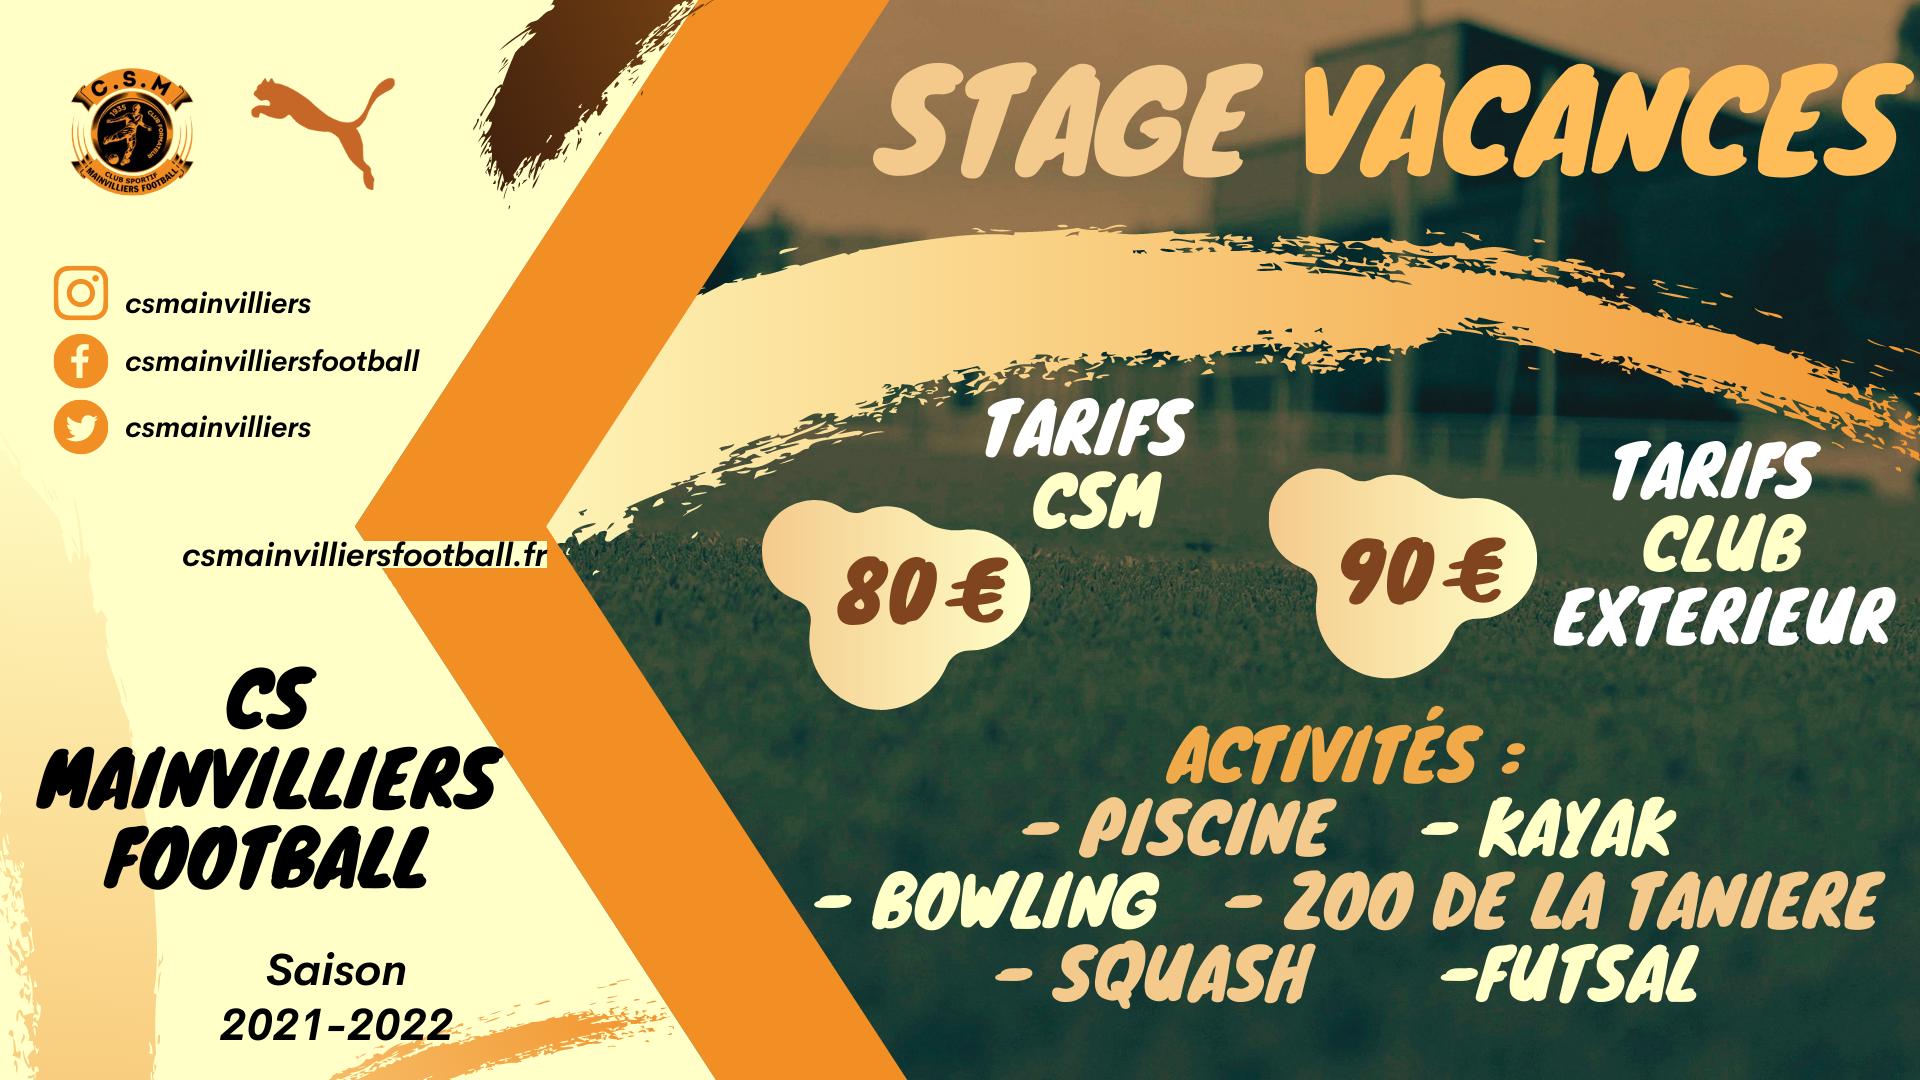 Stage Vacances Toussaint - CS Mainvilliers Football